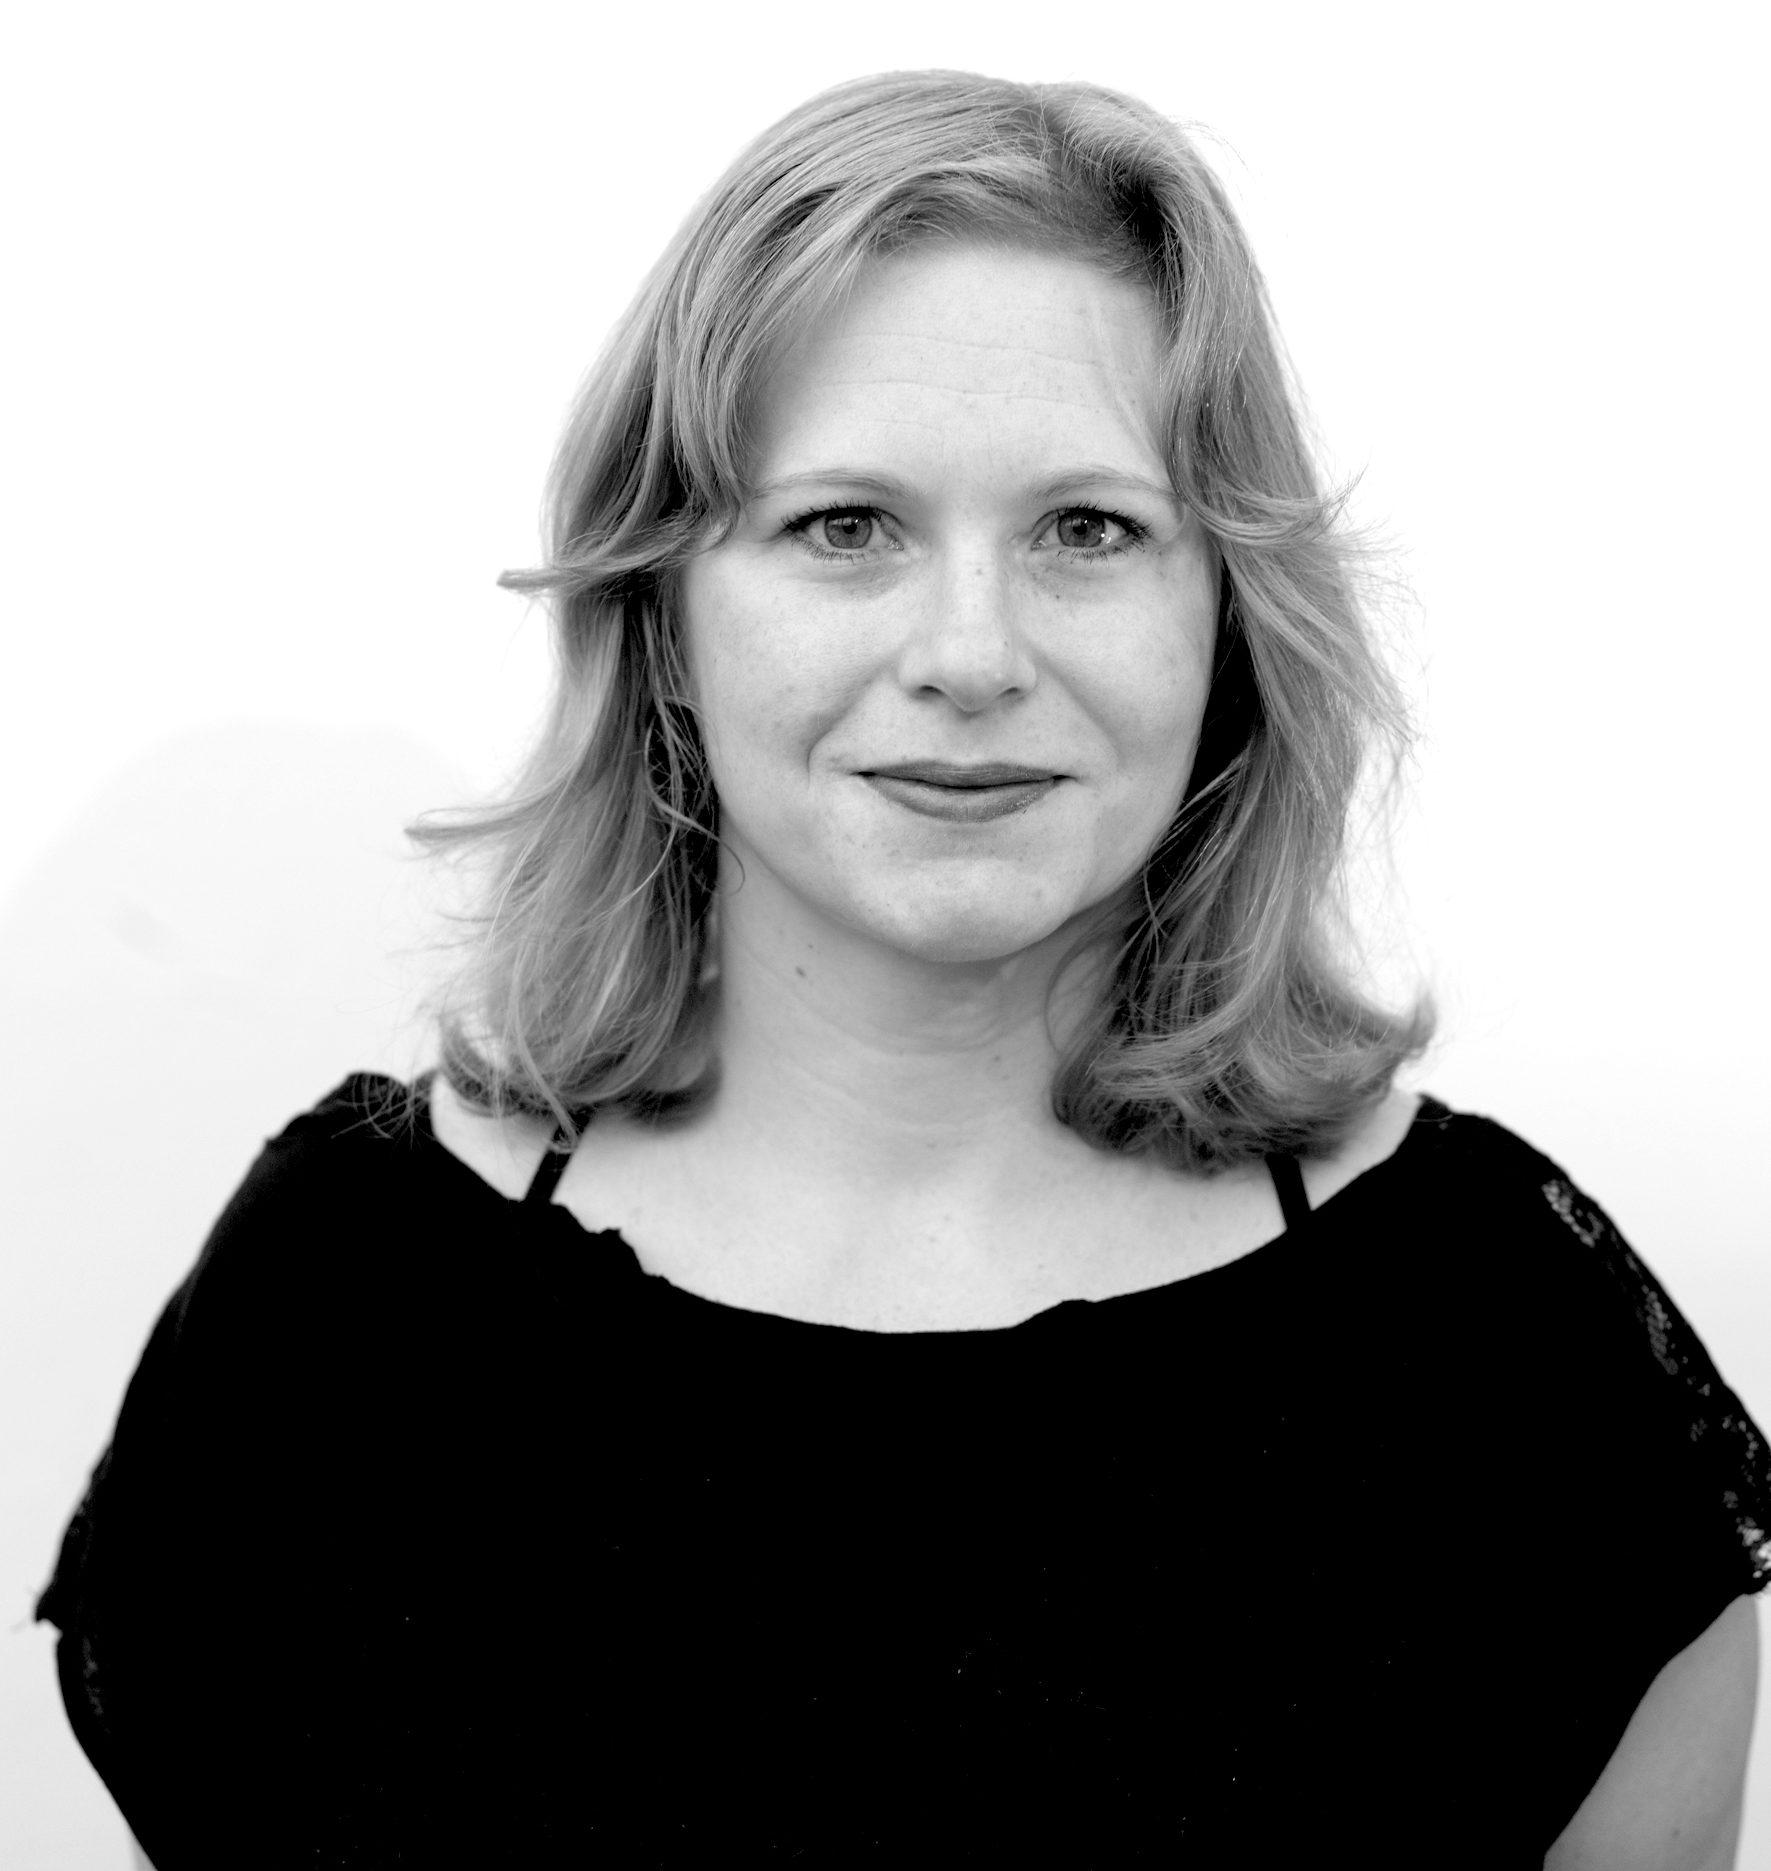 Korinna Lindinger